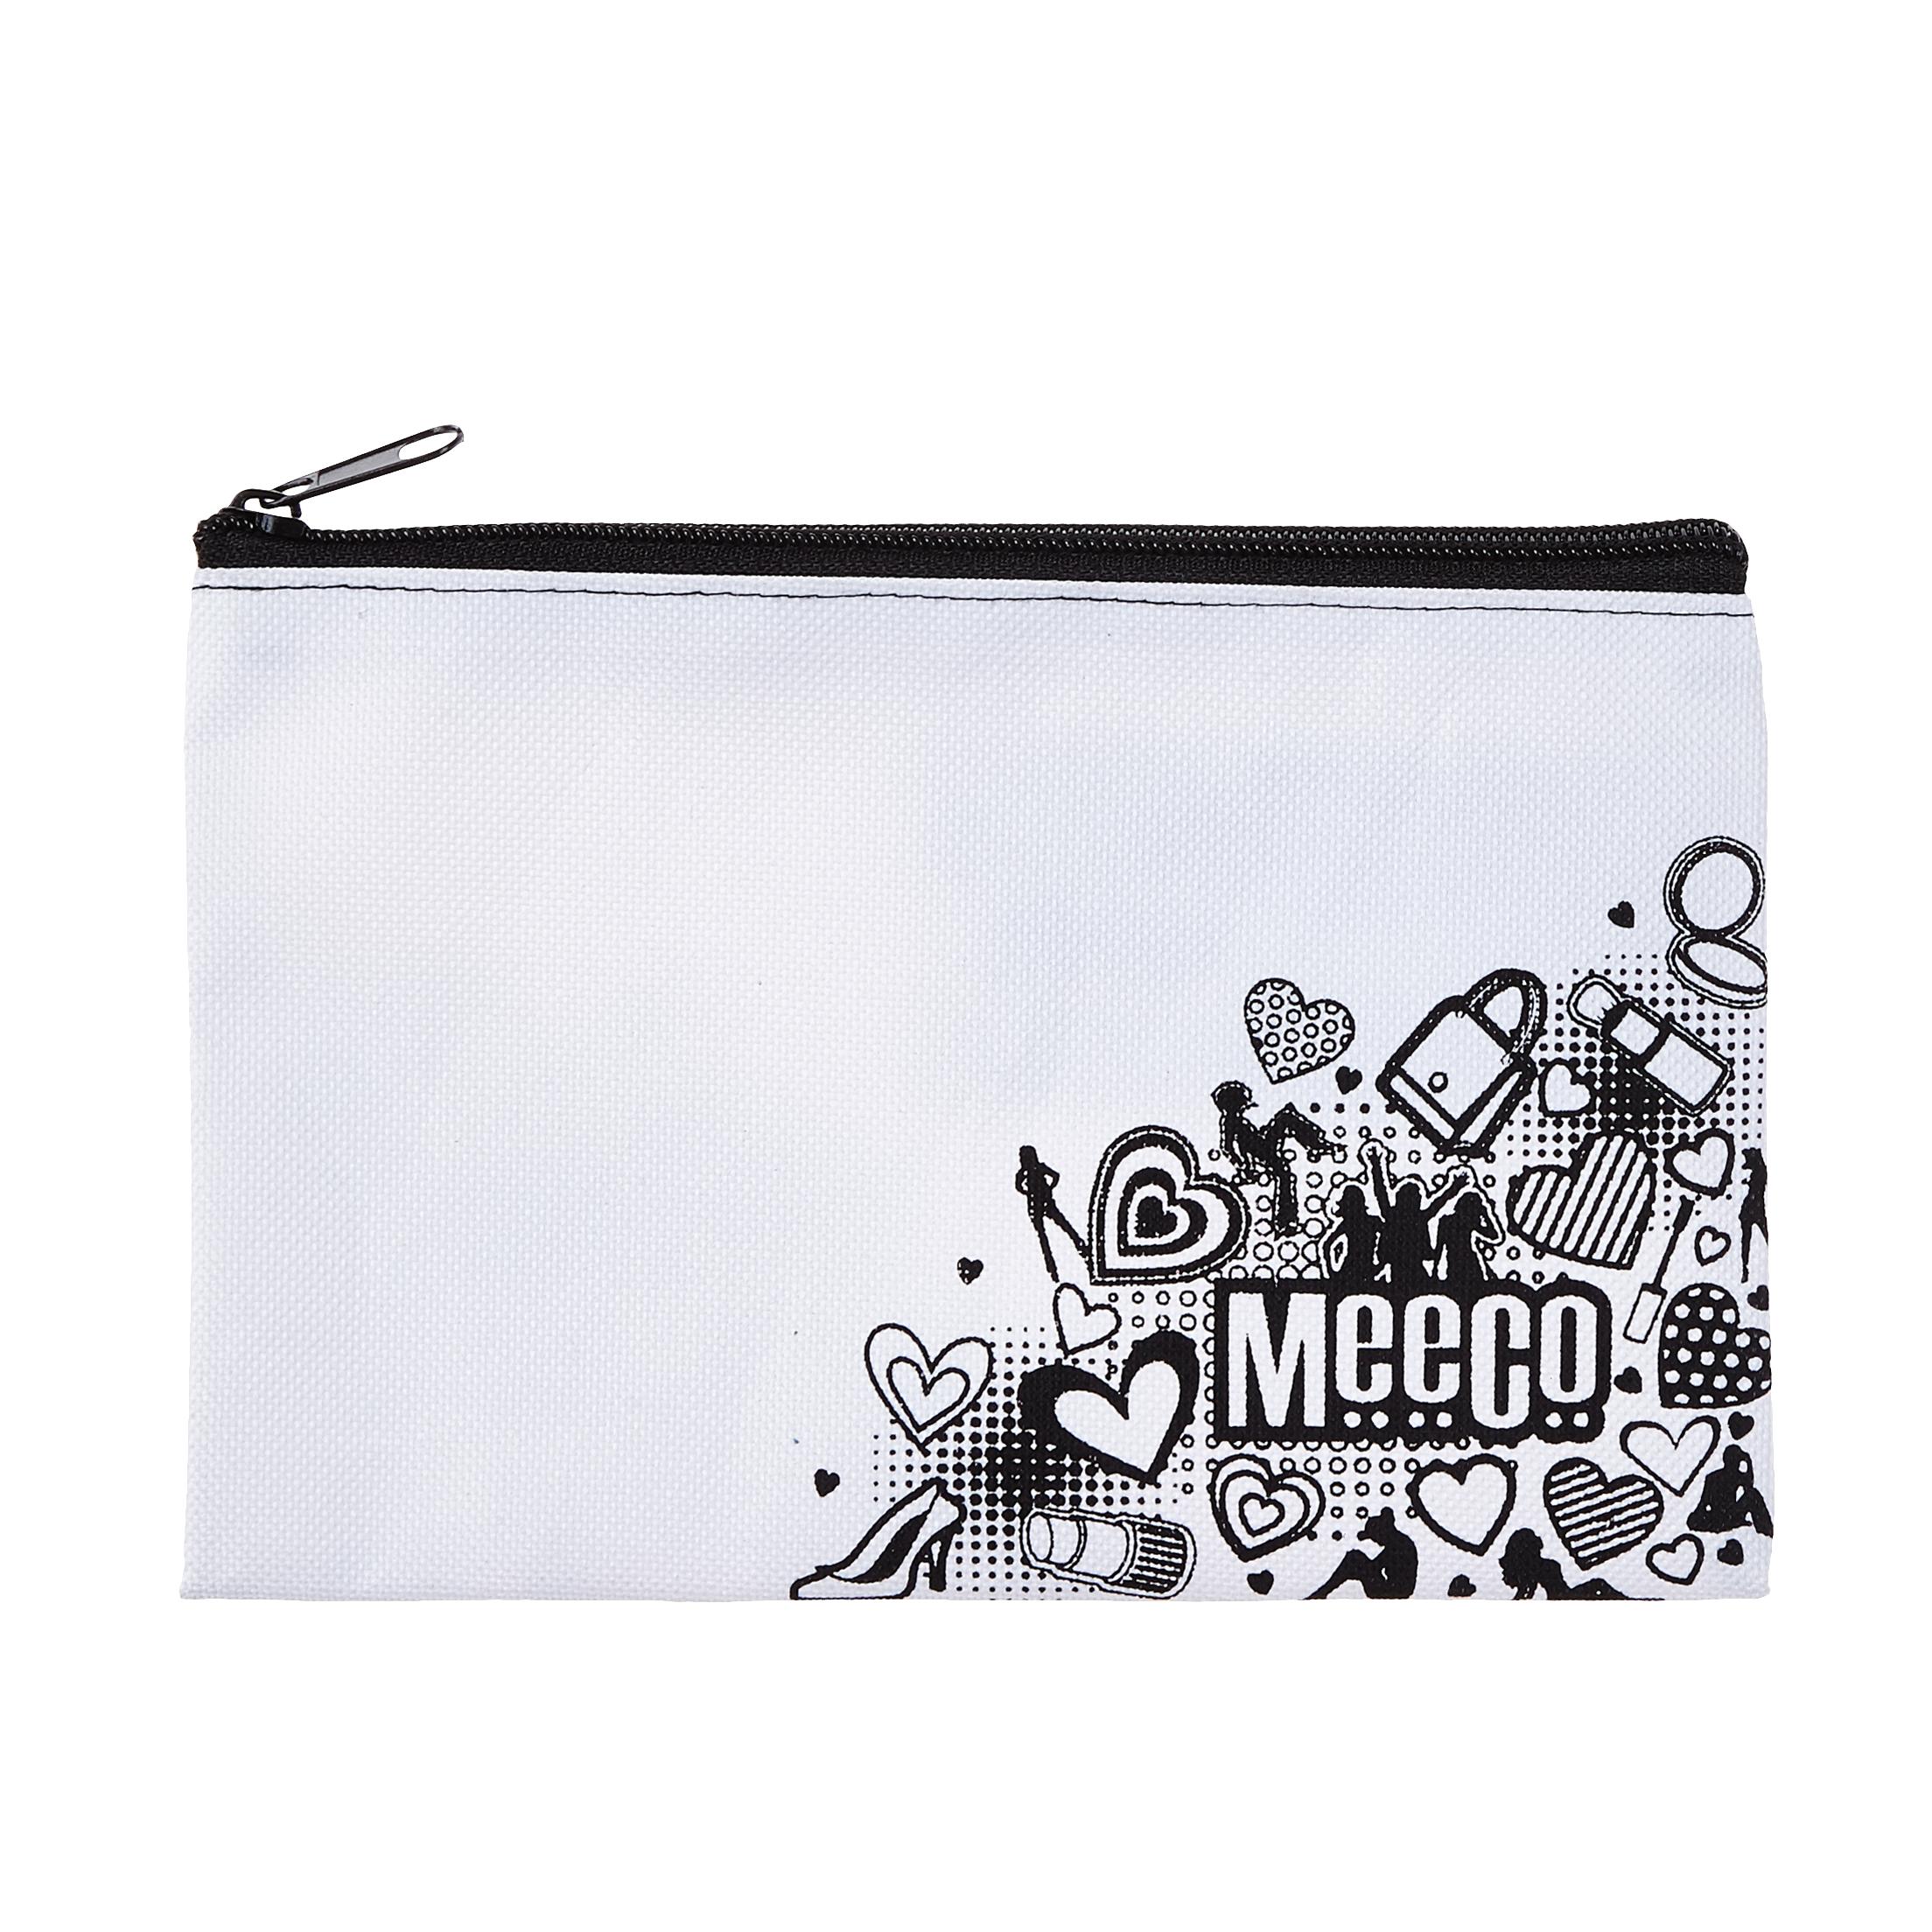 DoodleMe Pencil Bag Small